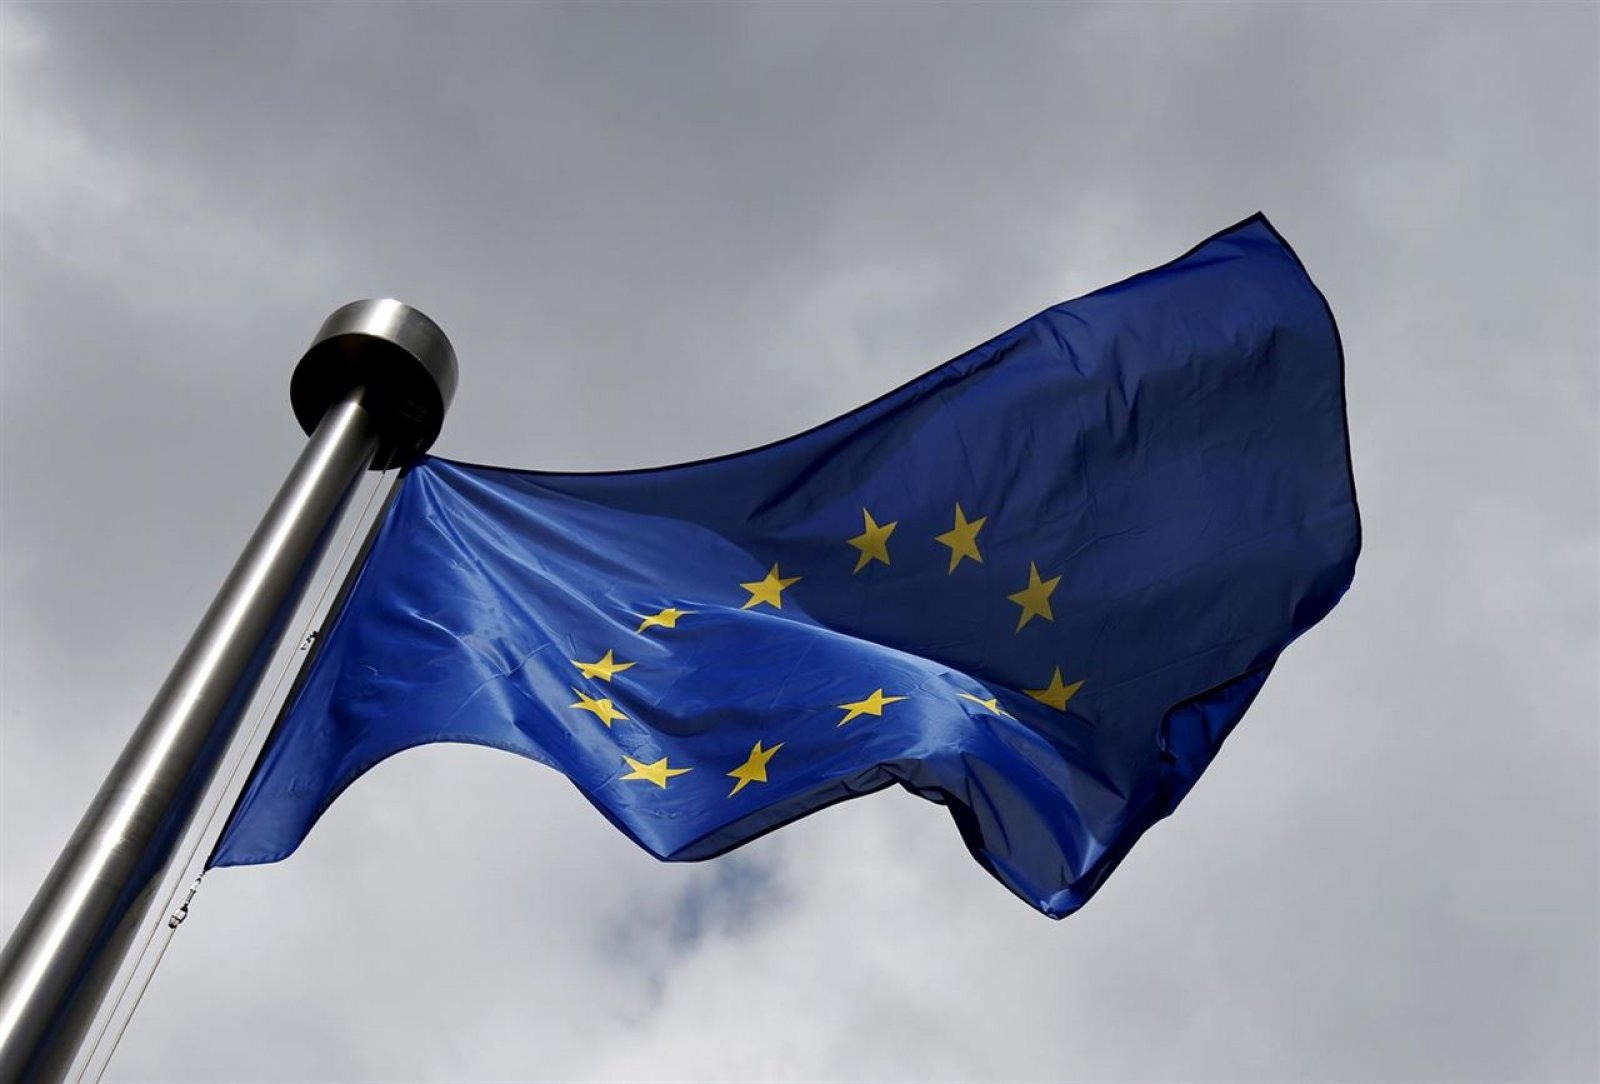 Bandera de la Unió Europea